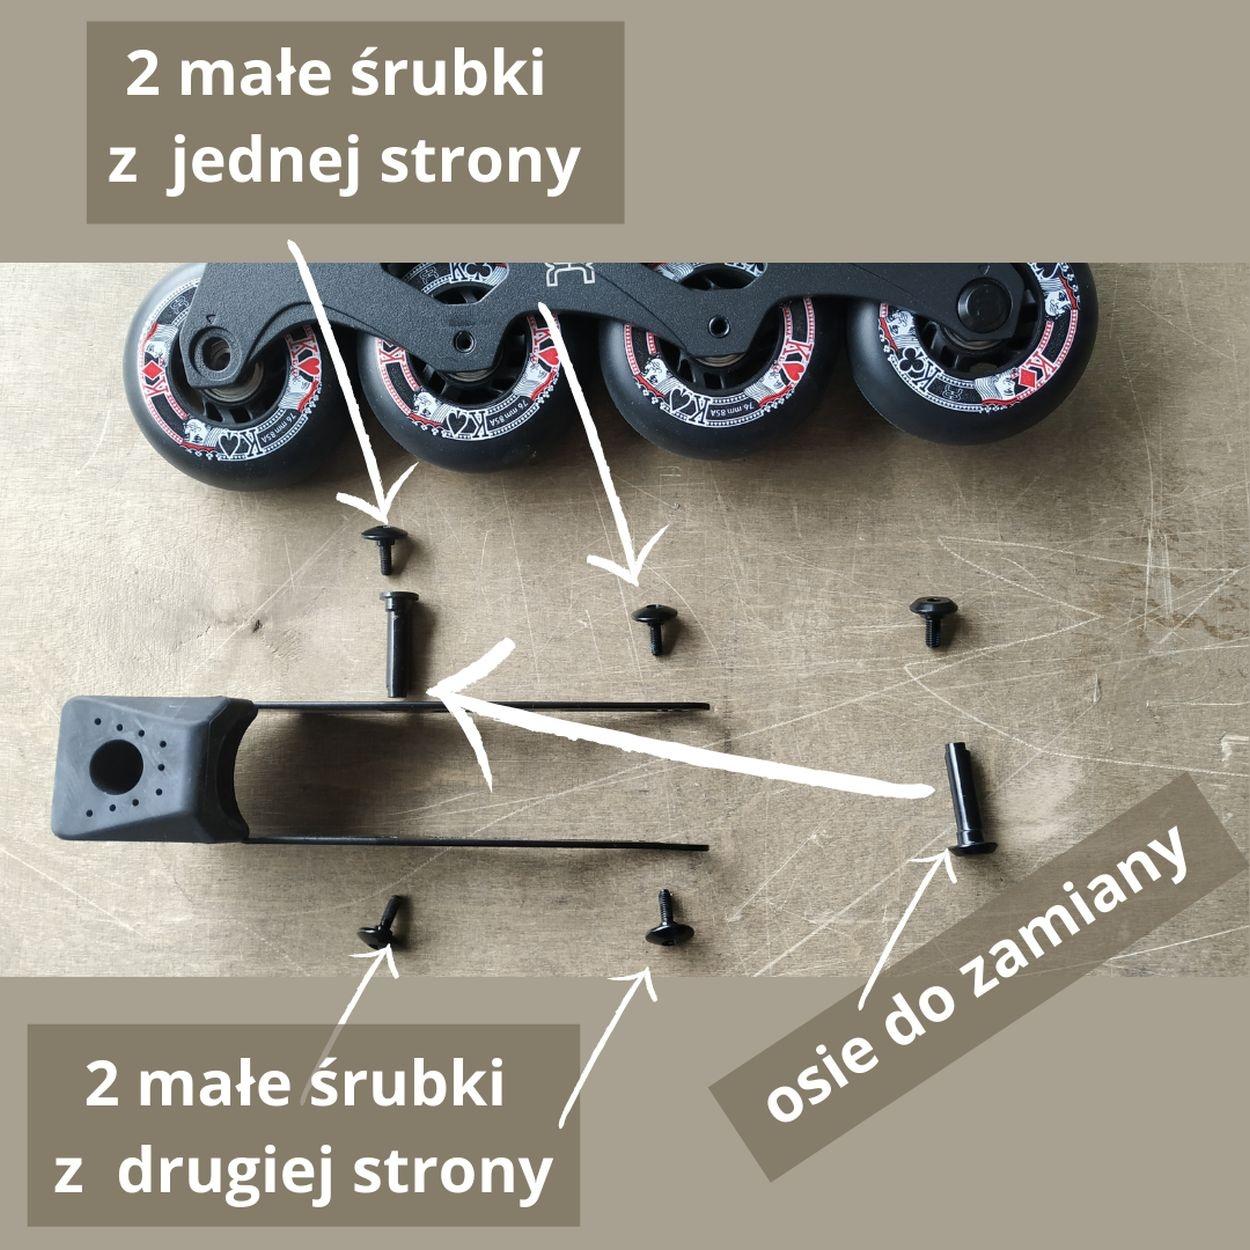 Jak odkręcić hamulec wrolkach